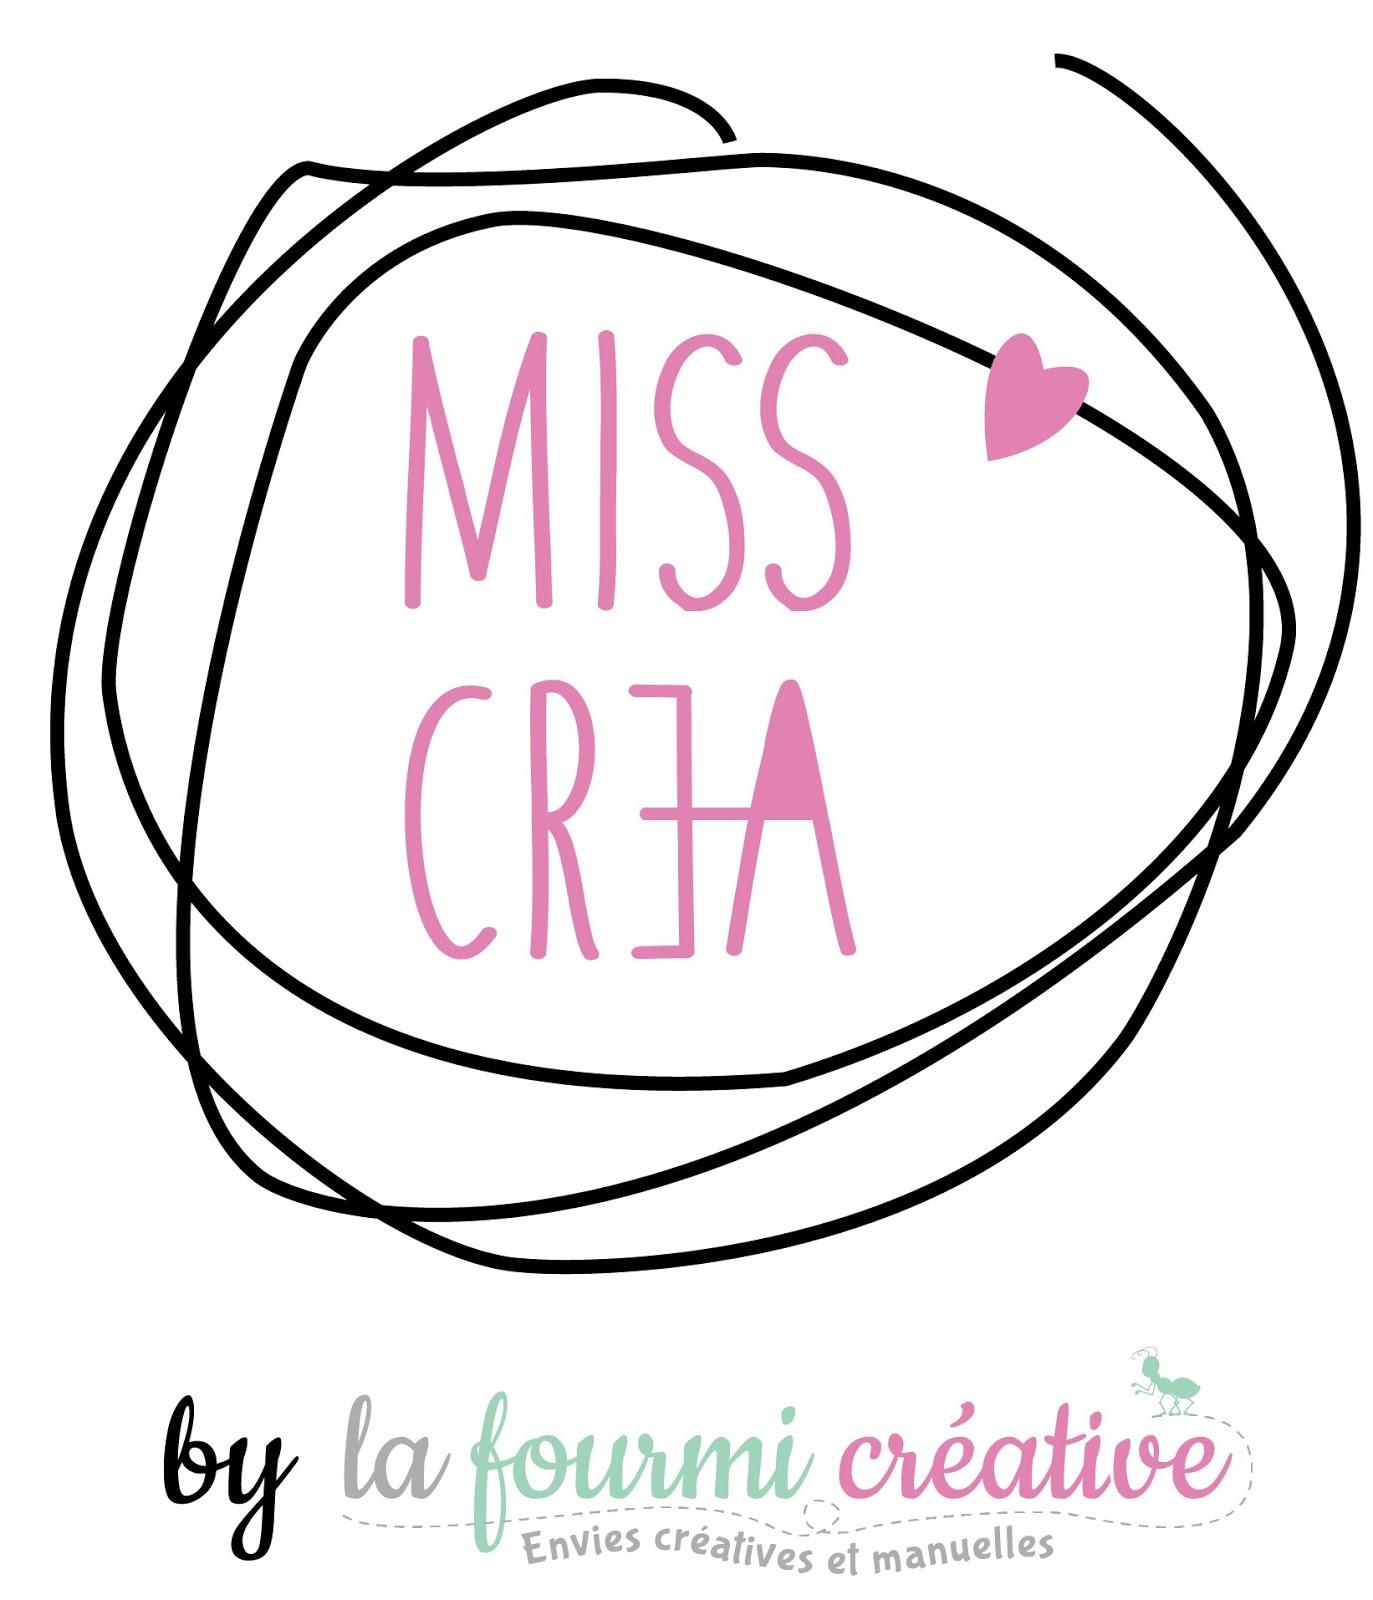 Miss CREA